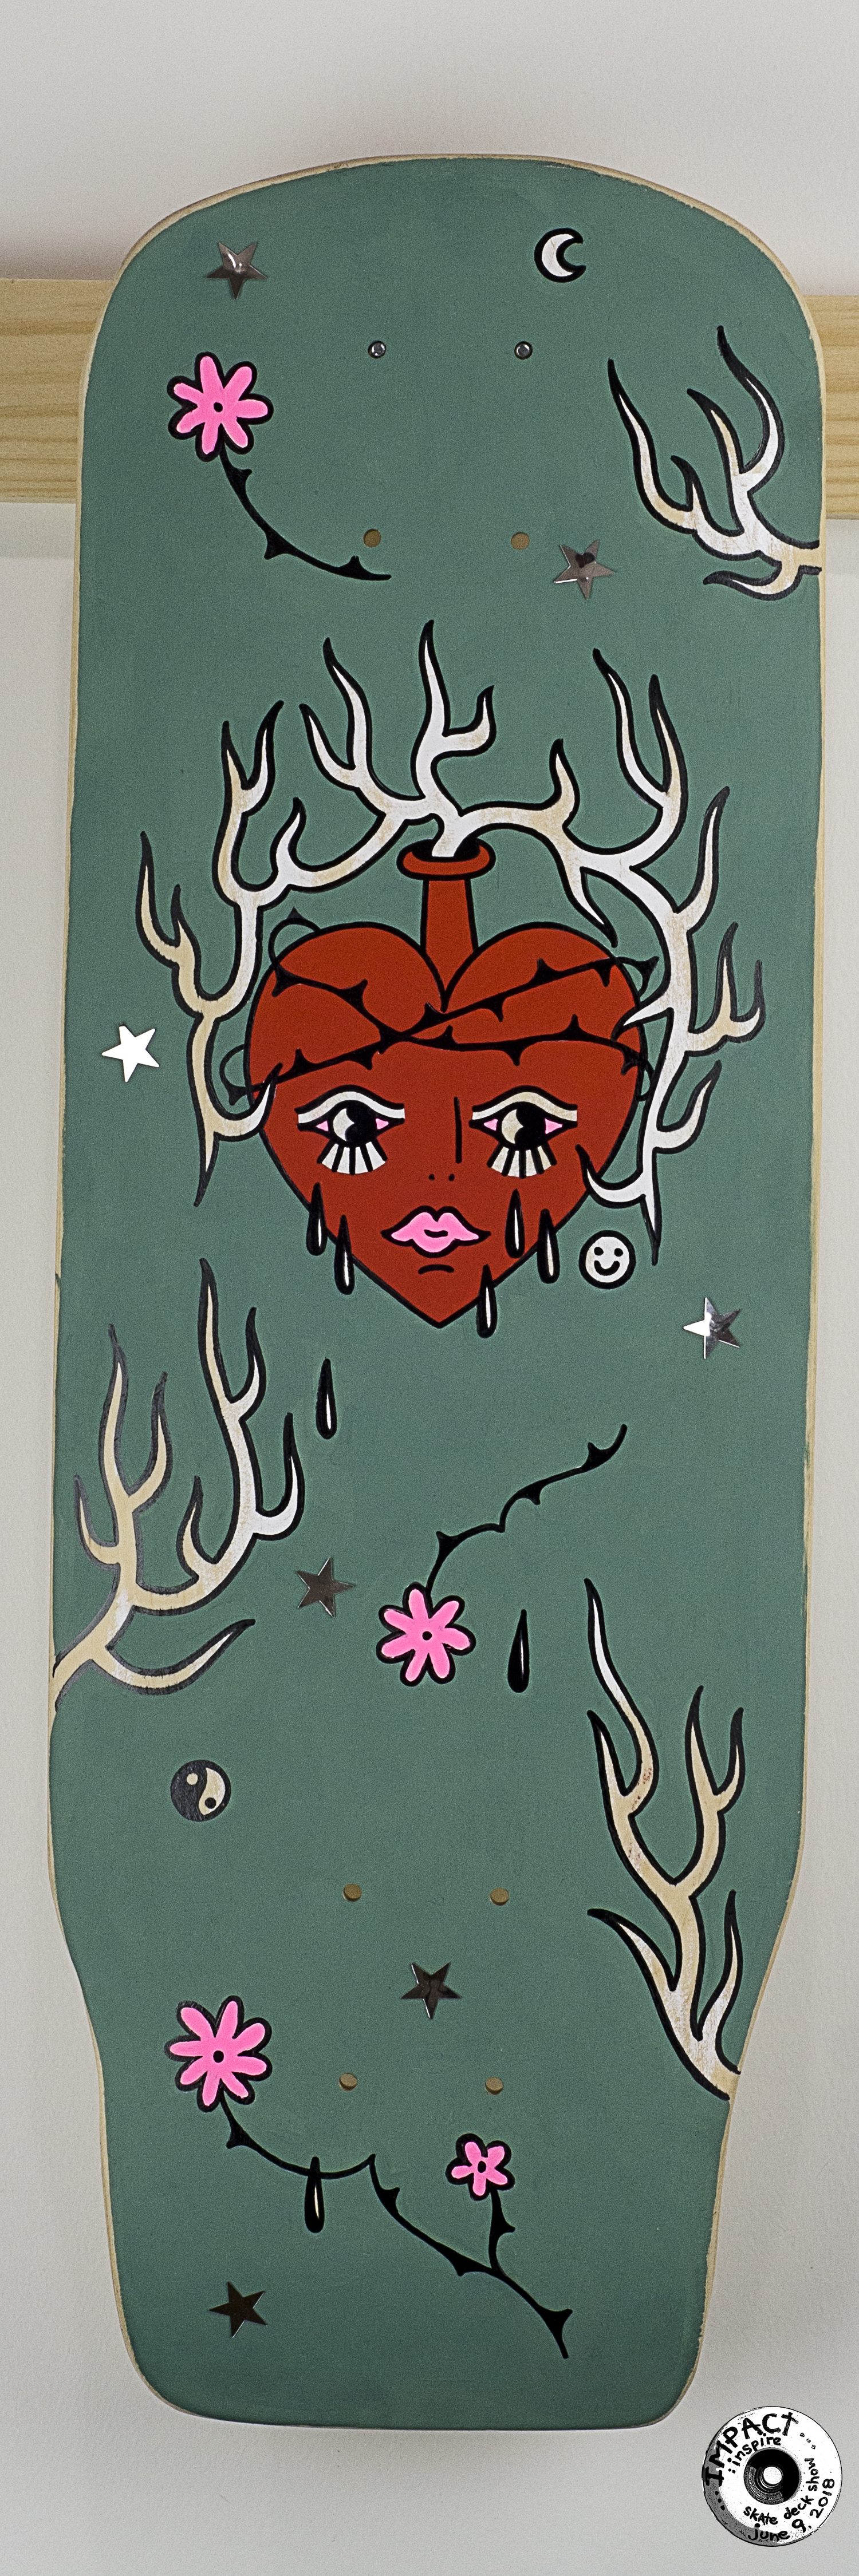 Michelle Wanhala - Untitled - 2018